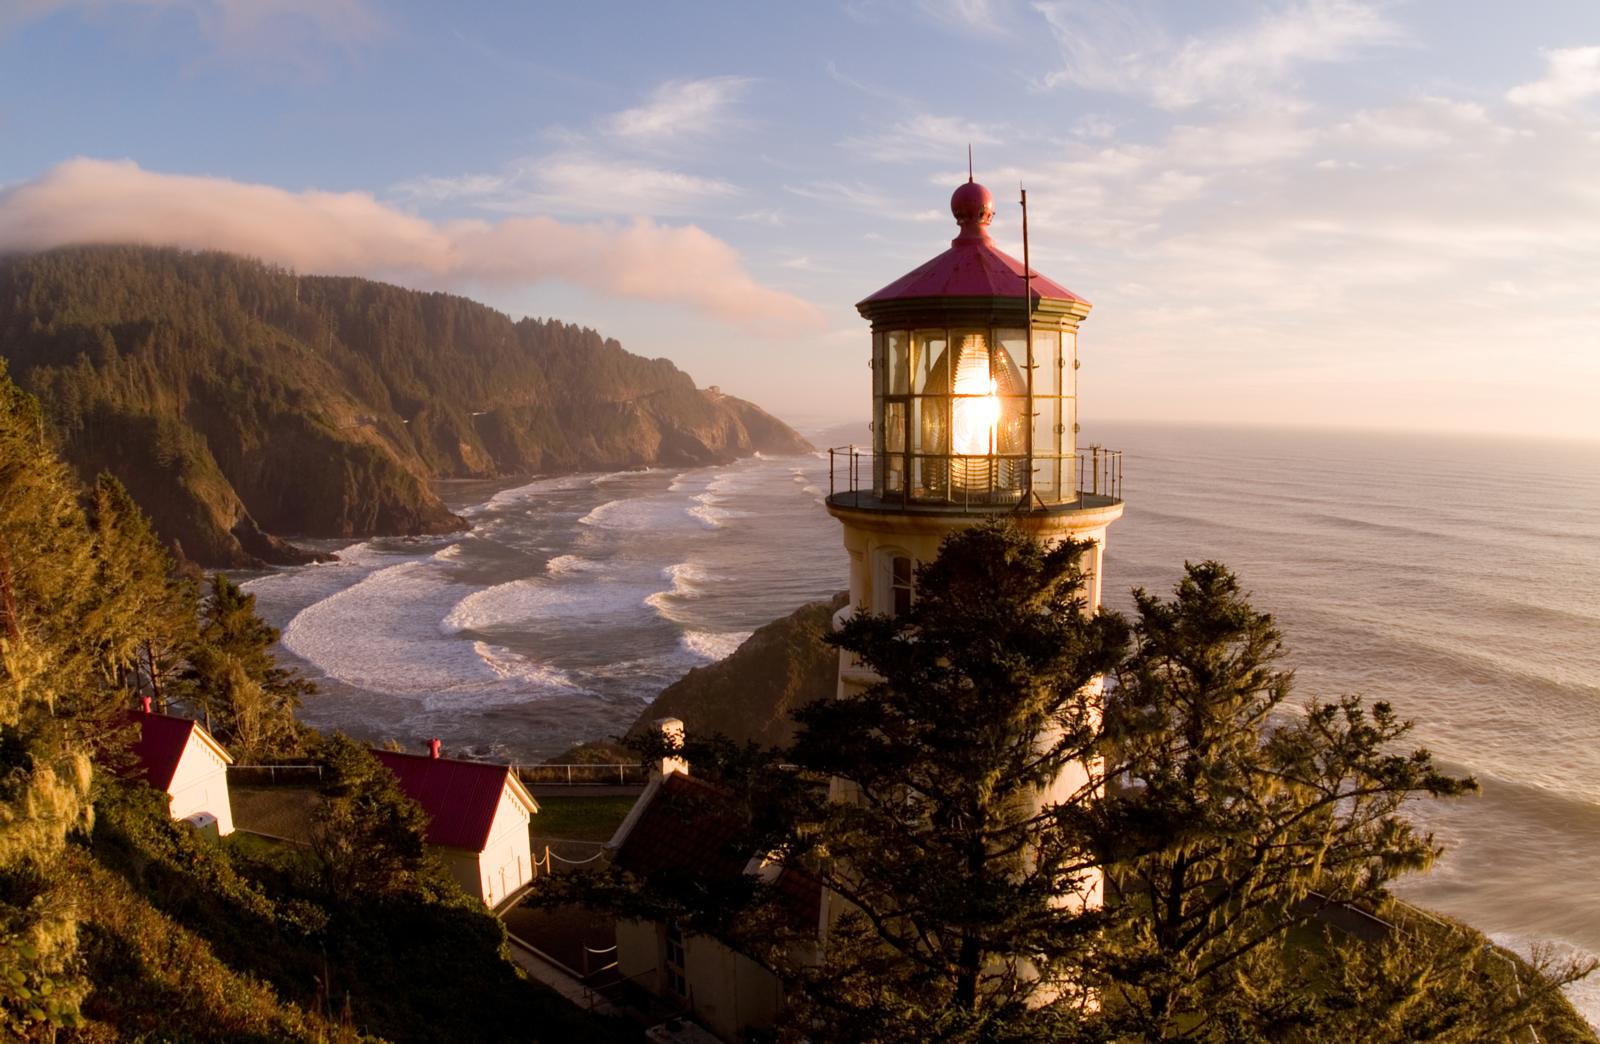 Heceta Head Lighthouse (Oregon Parks and Recreation Dept.)